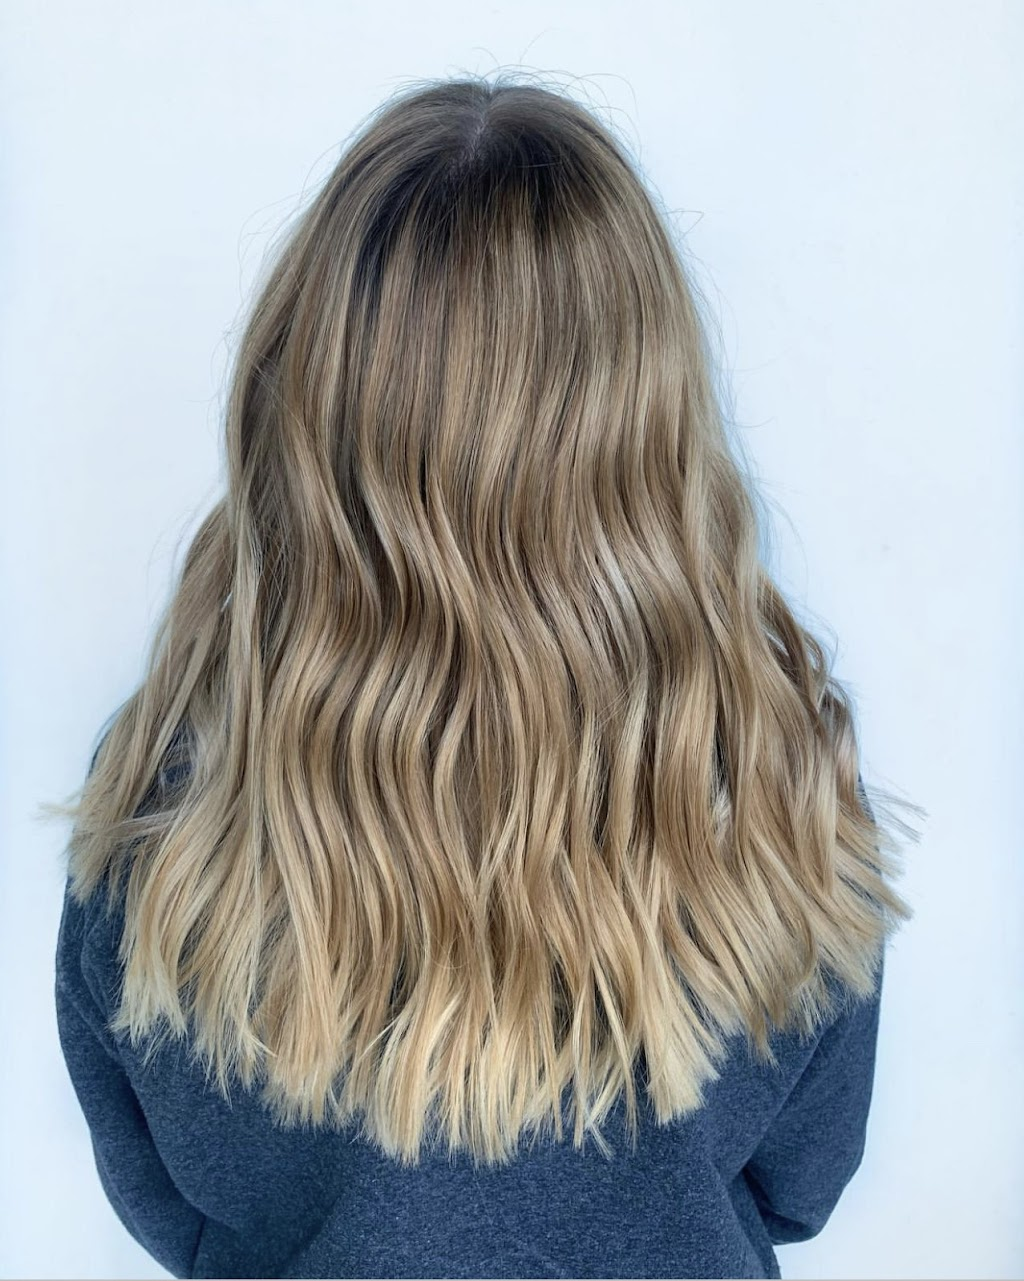 Evolve Simply Beauty - hair care    Photo 4 of 10   Address: 4590 N Maize Rd #8, Maize, KS 67101, USA   Phone: (316) 927-2400